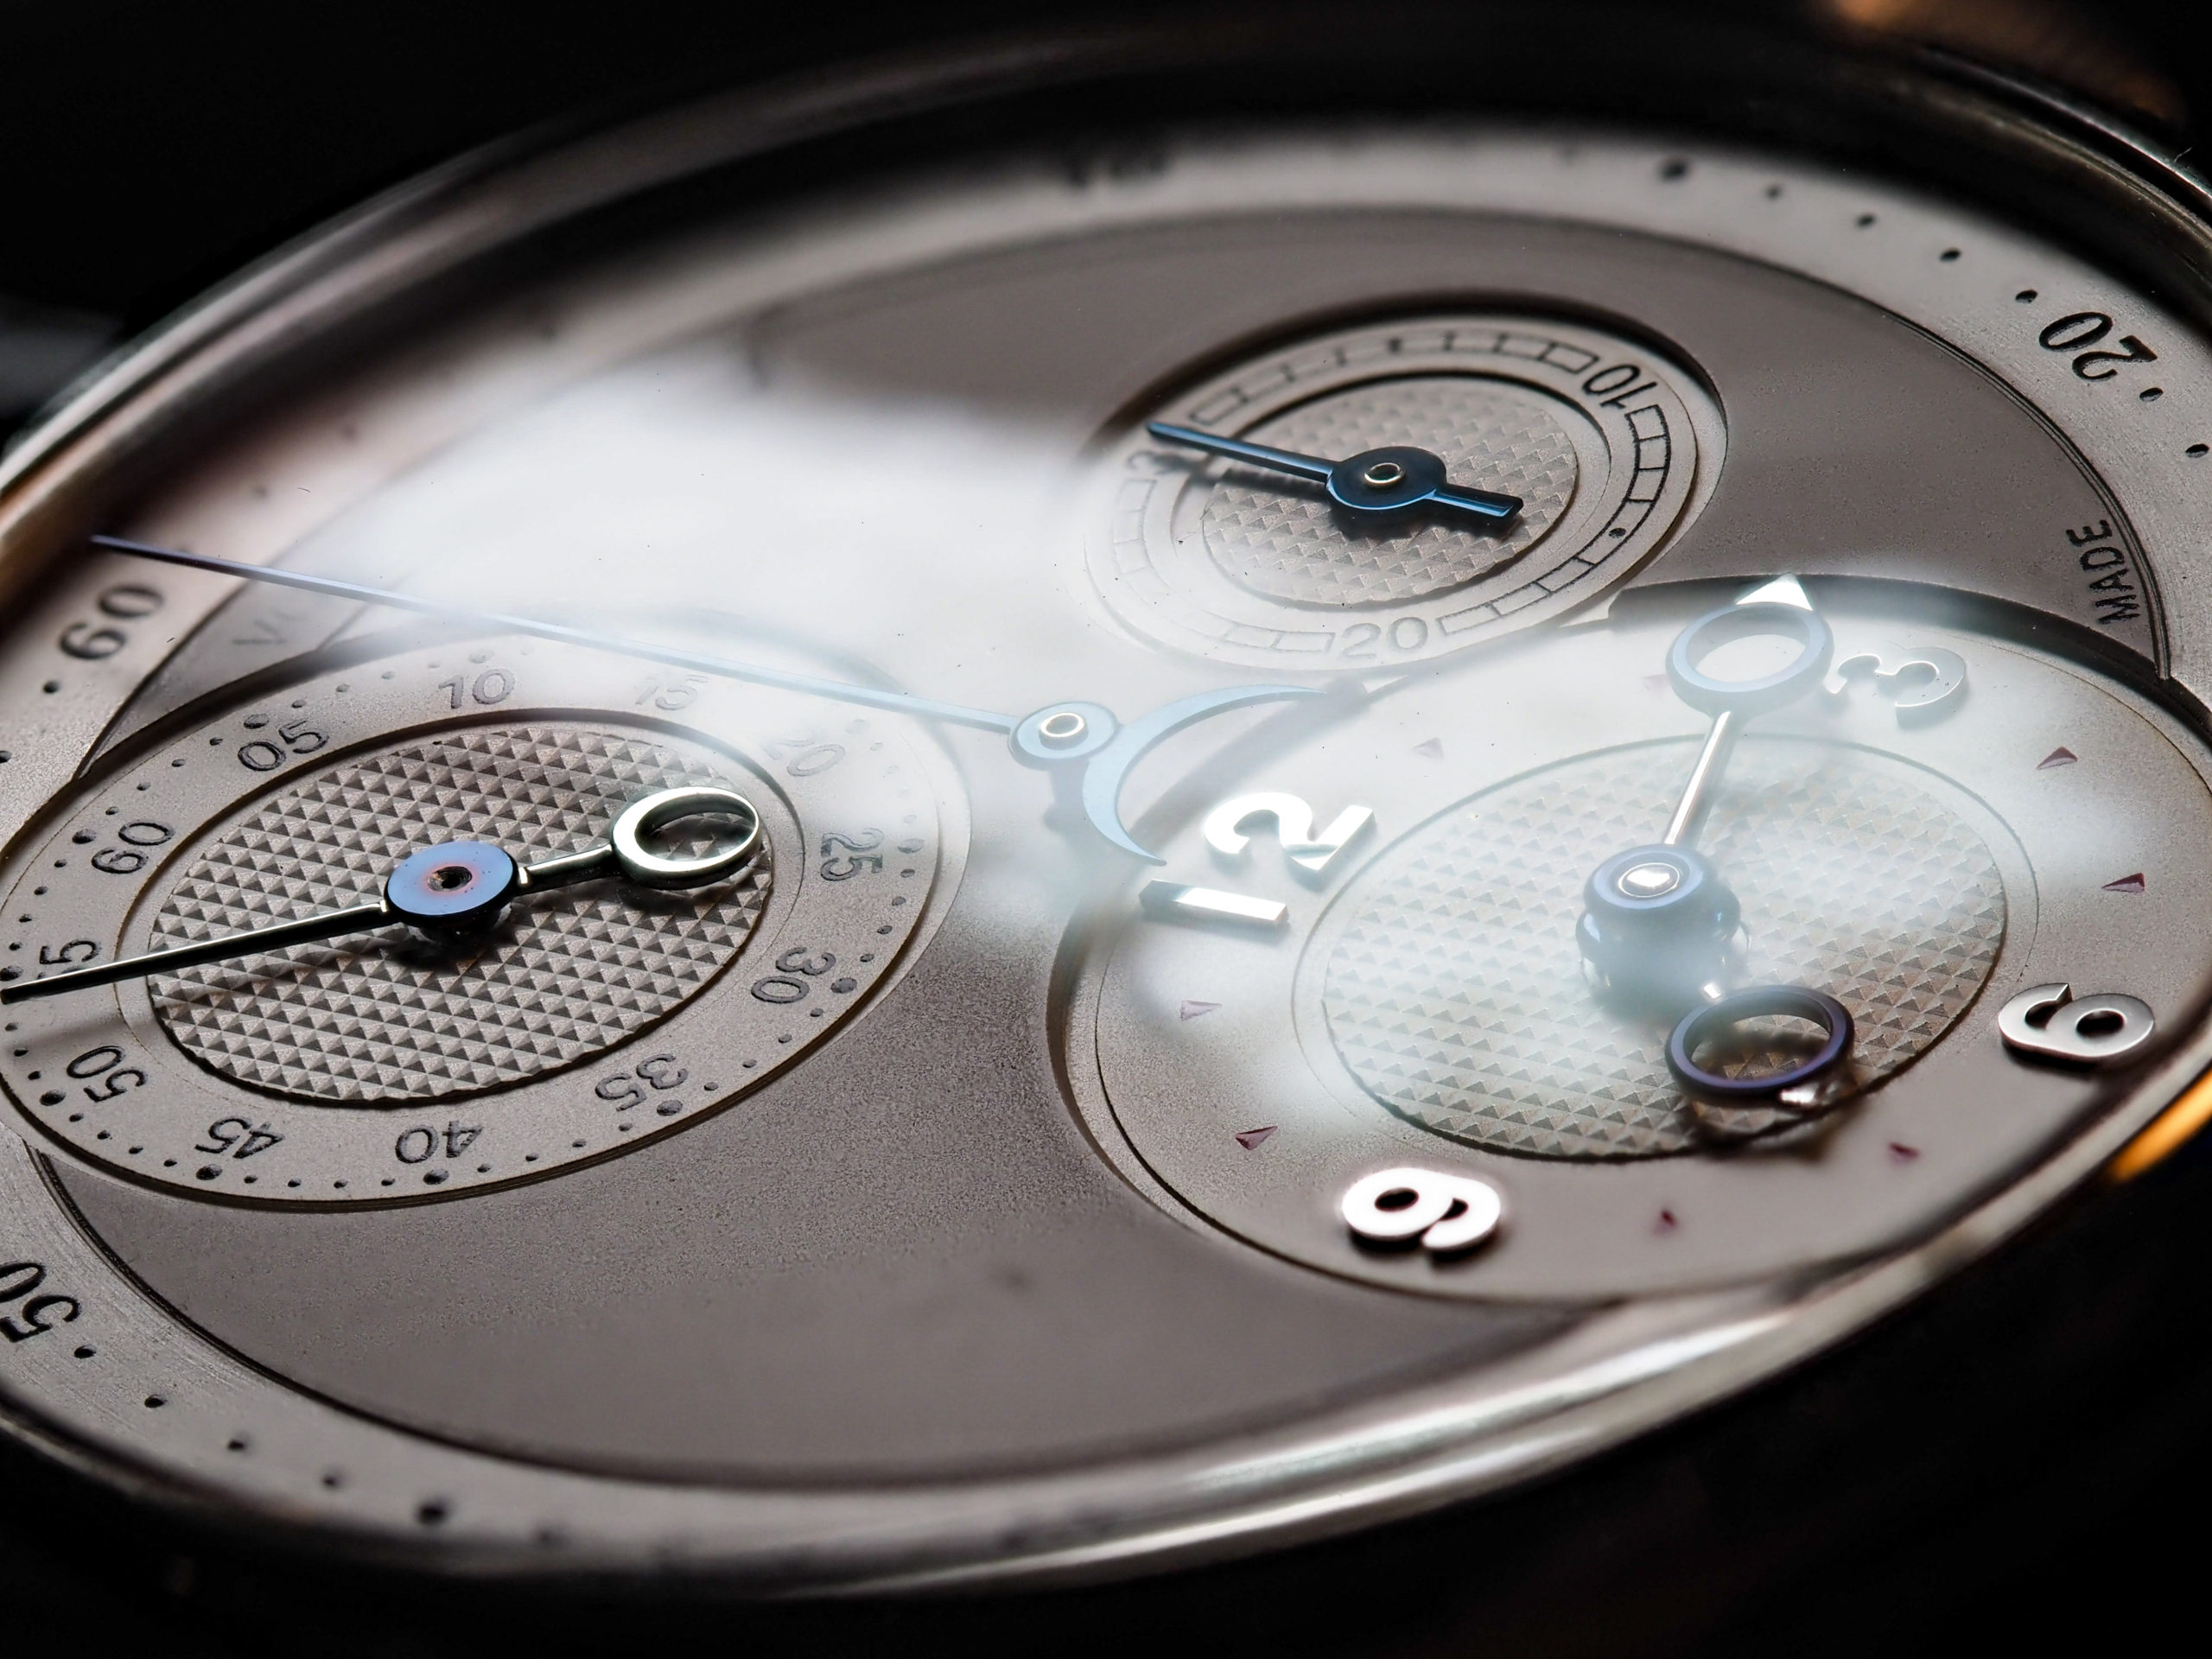 Kari Voutilainen Masterpiece Chronograph Dial